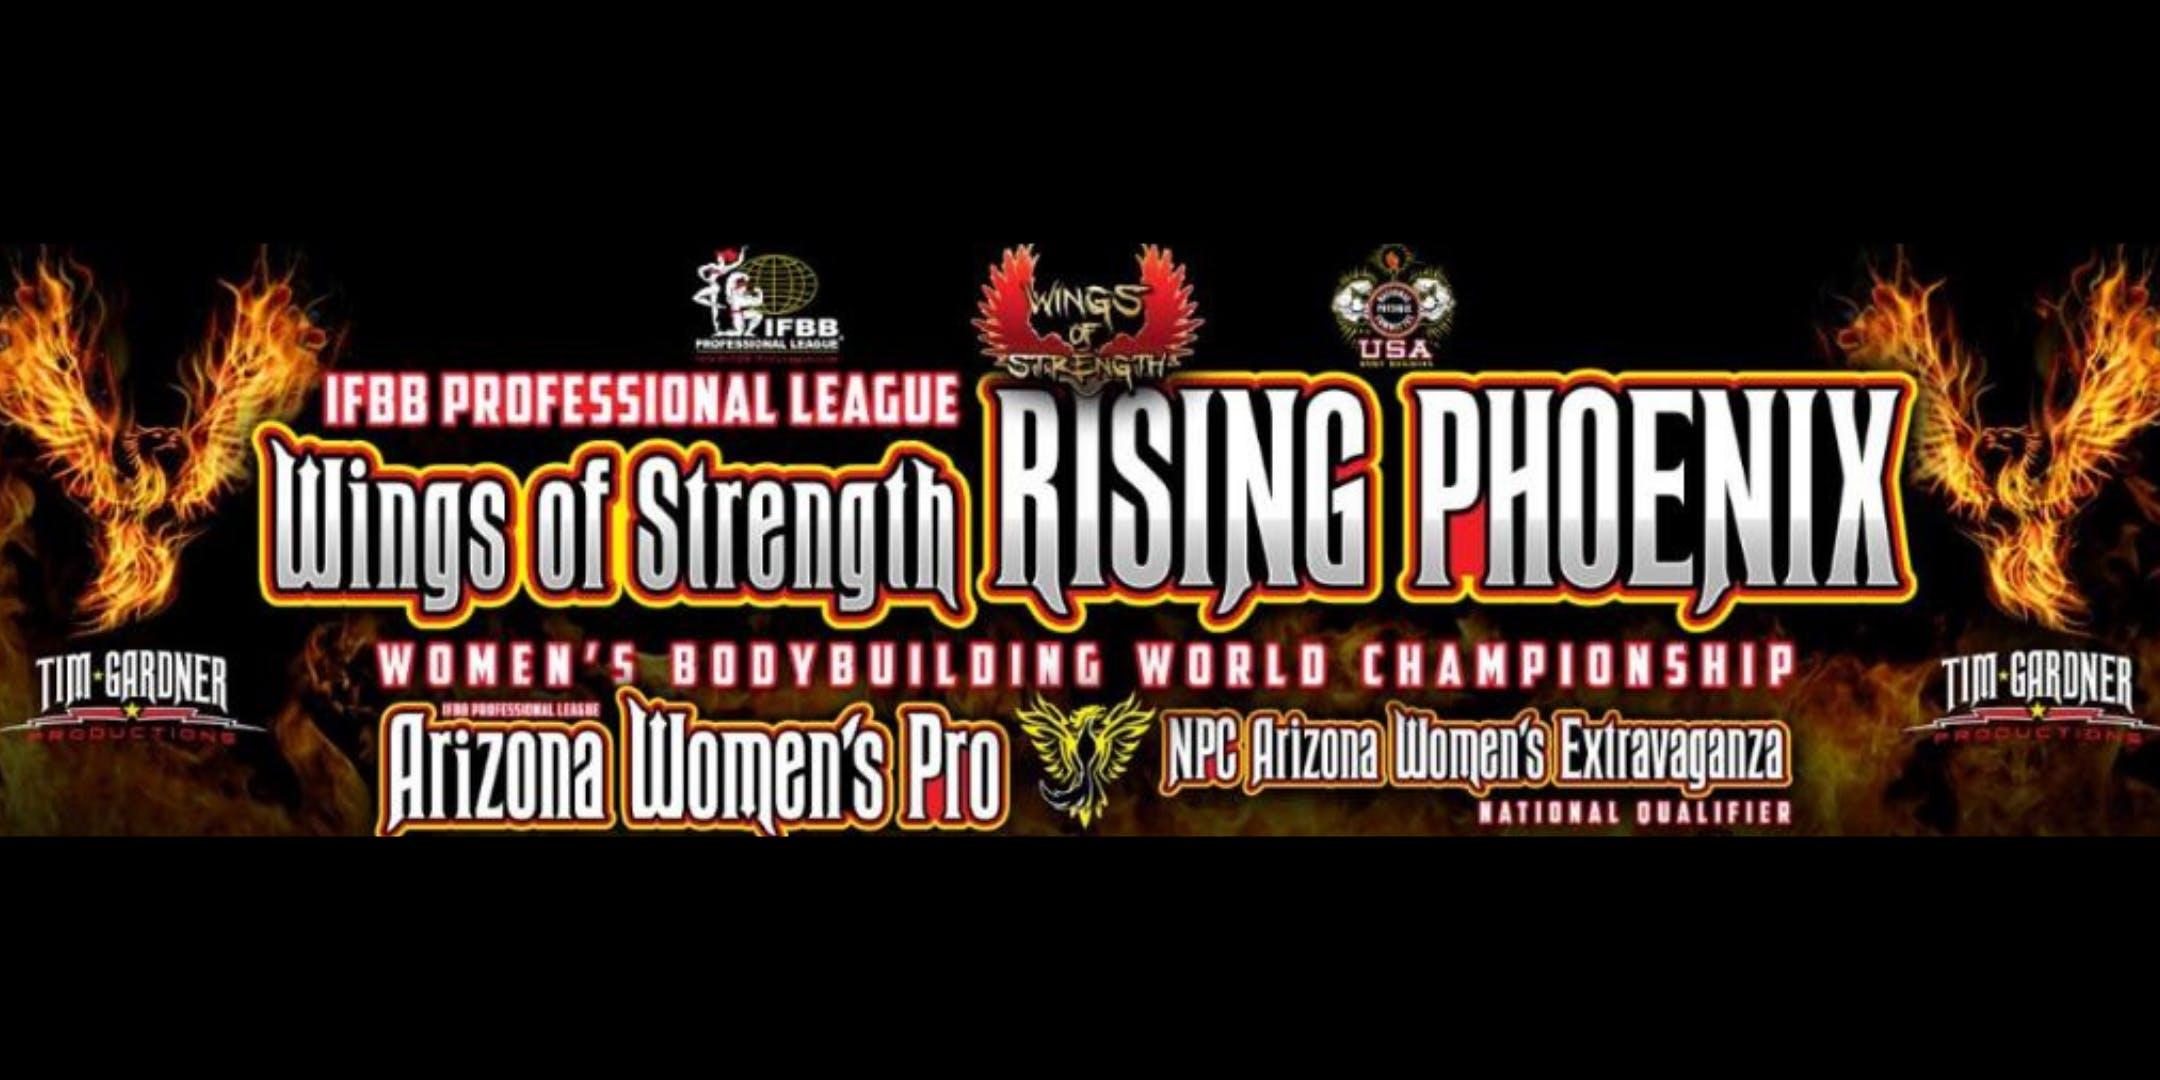 Rising Phoenix Women's World Bodybuilding Championship & Arizona Women's Pro-Am